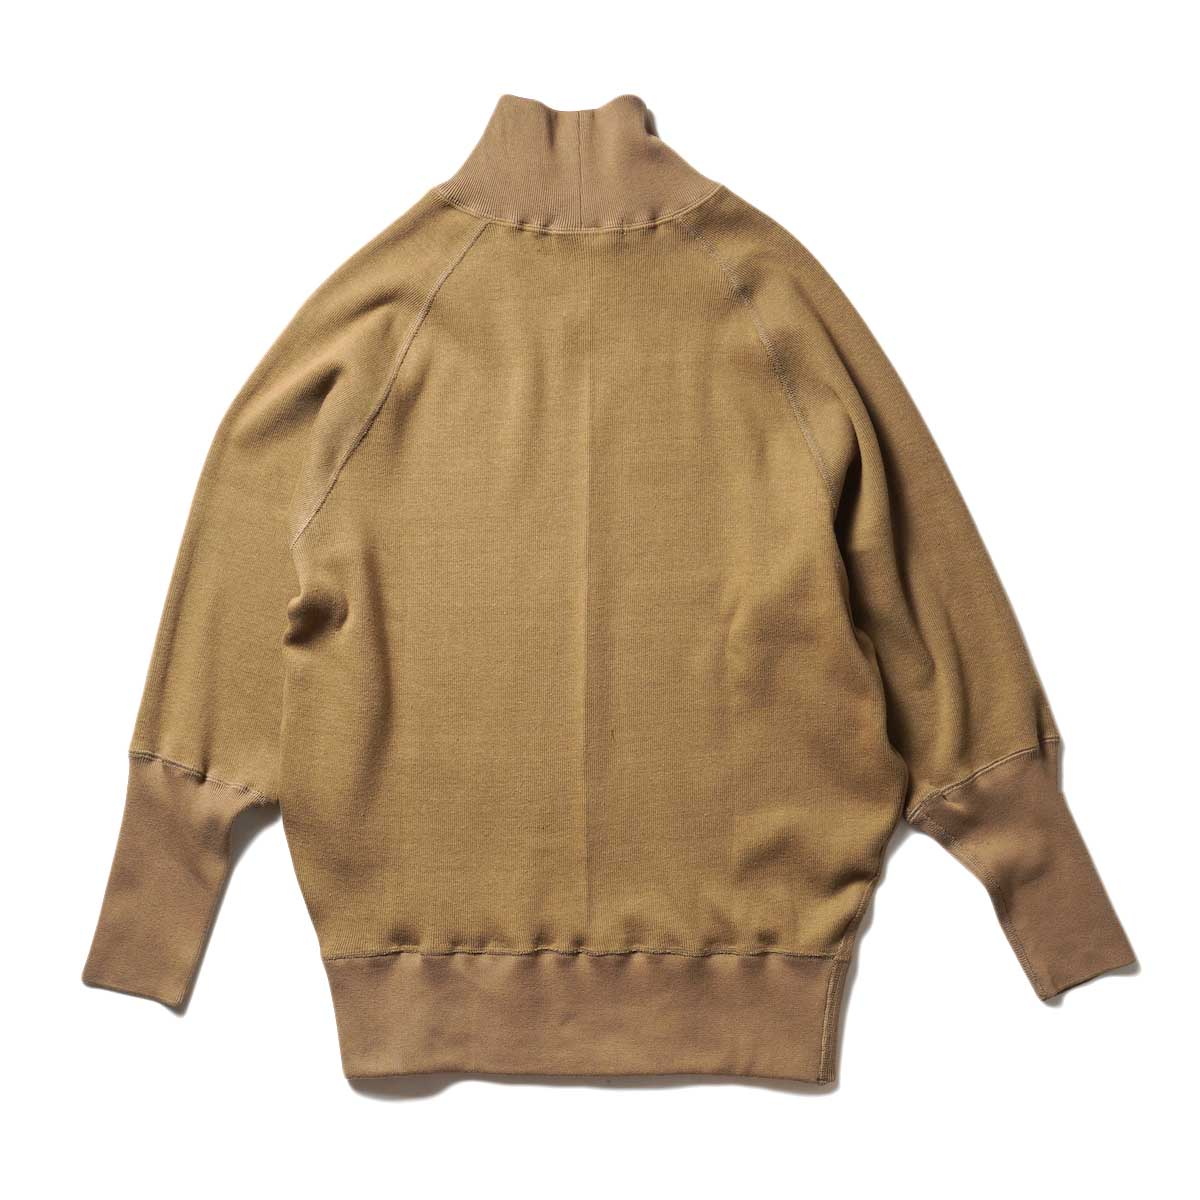 ARCHI / CIRCULAR RIB HIGH NECK TOP (Khaki) 背面